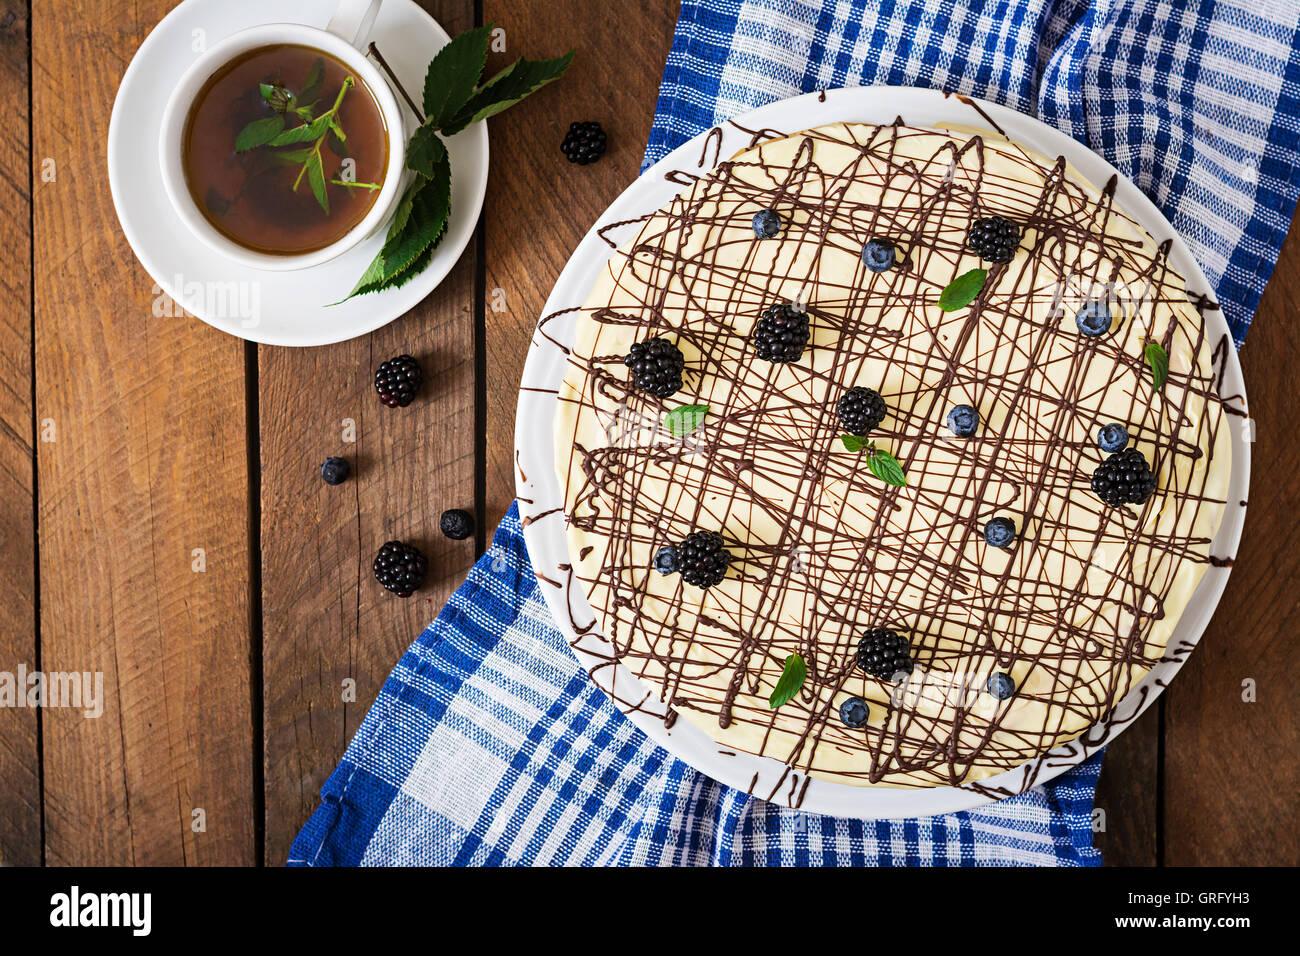 Chocolate Cake 'Bird's milk'. Top view - Stock Image